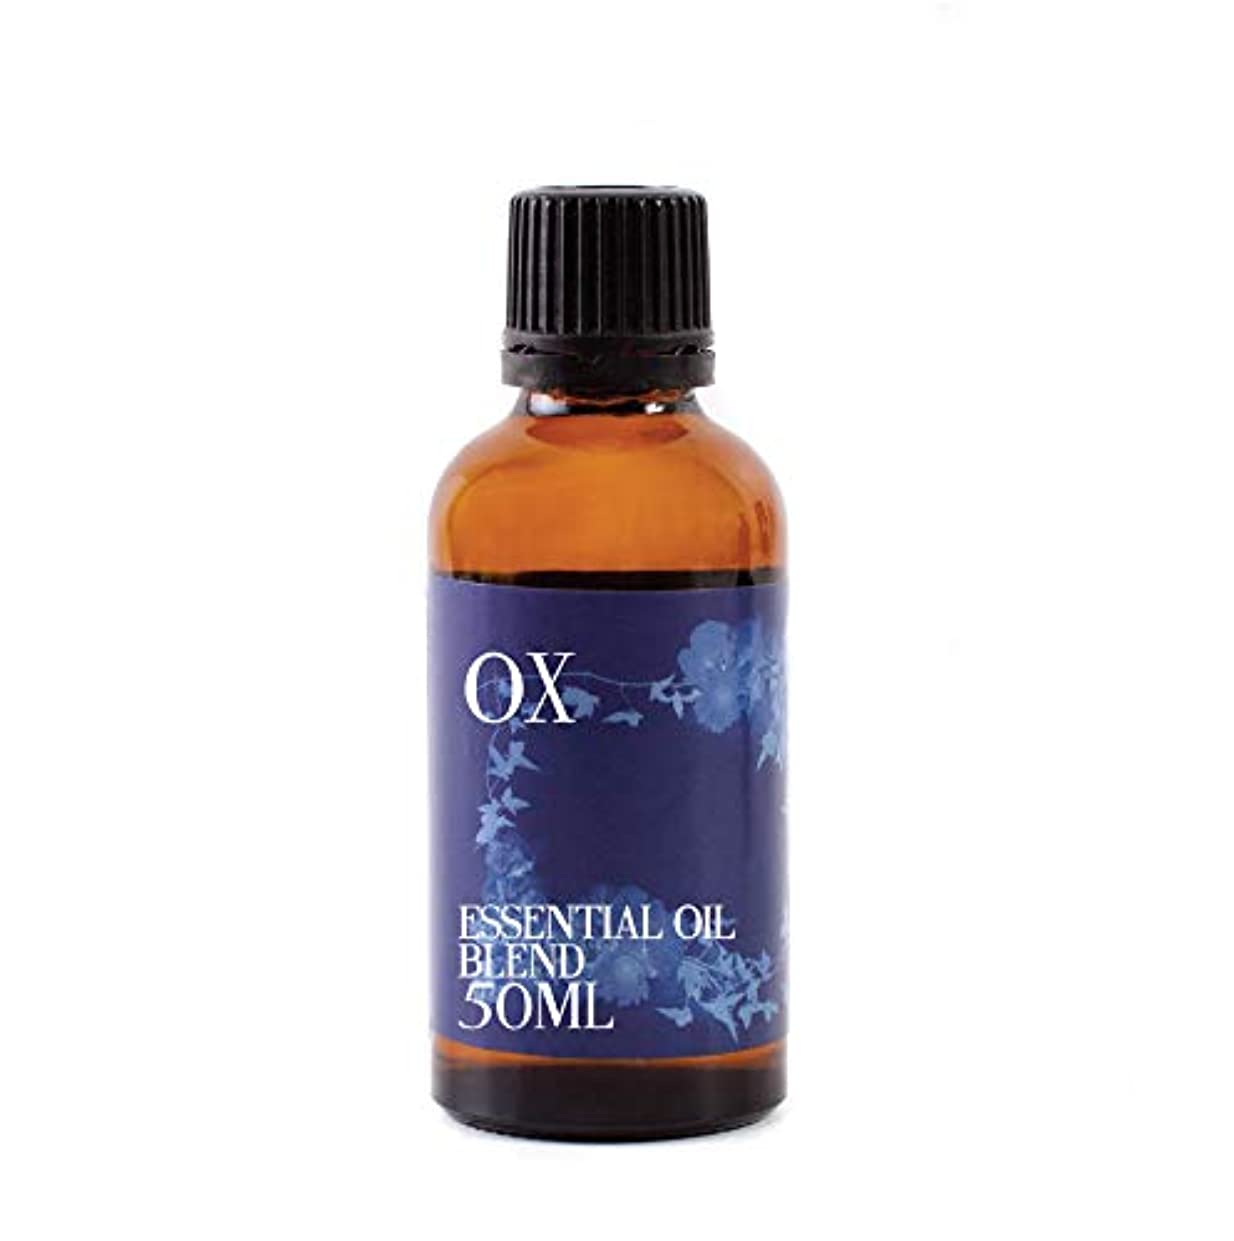 文明化一元化する国民Mystix London | Ox | Chinese Zodiac Essential Oil Blend 50ml